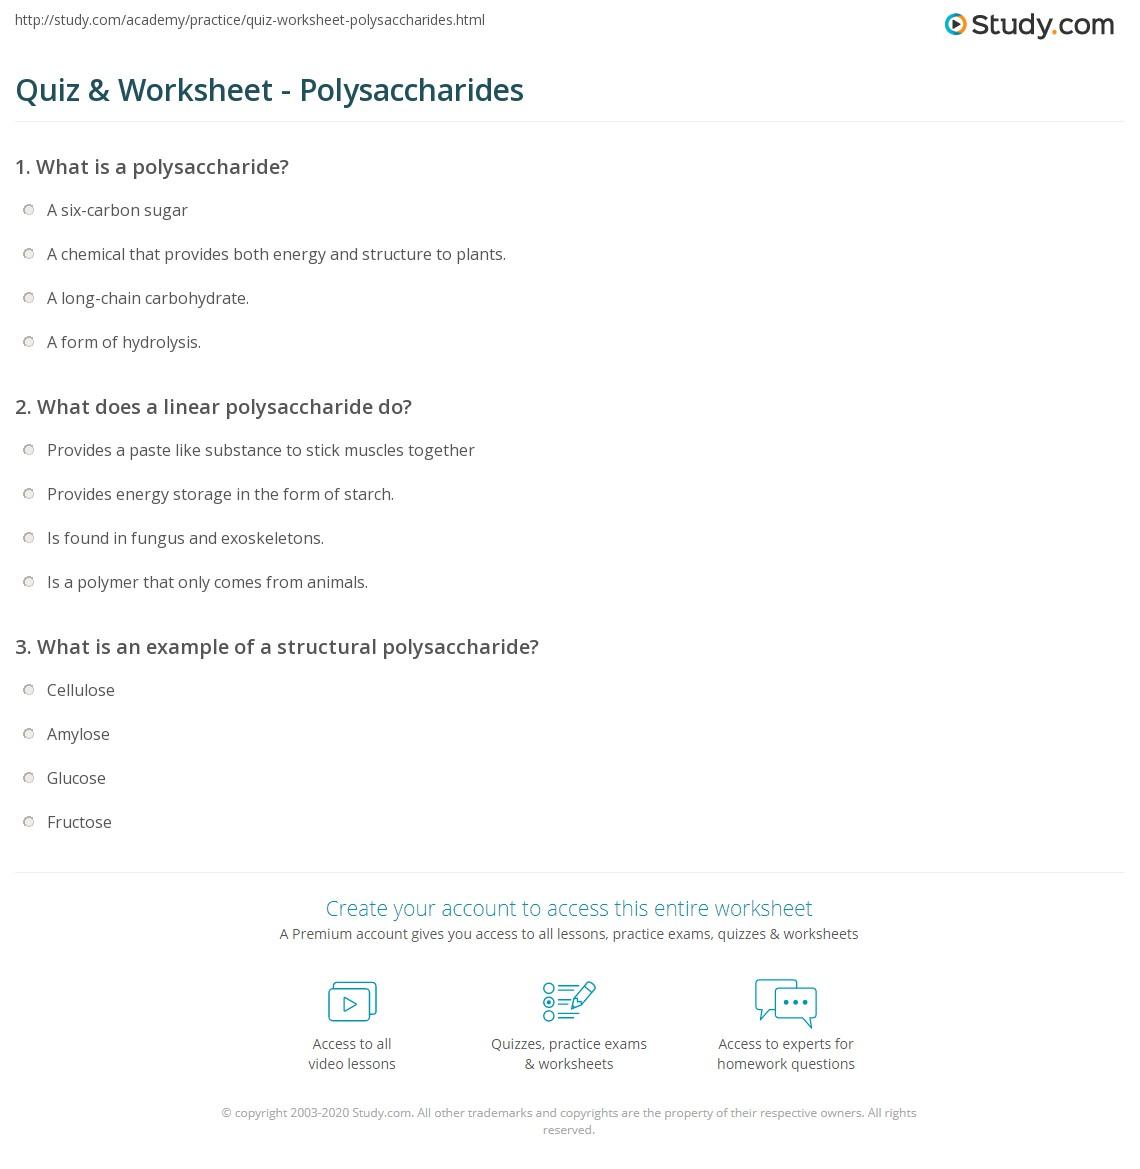 Quiz Worksheet Polysaccharides Study